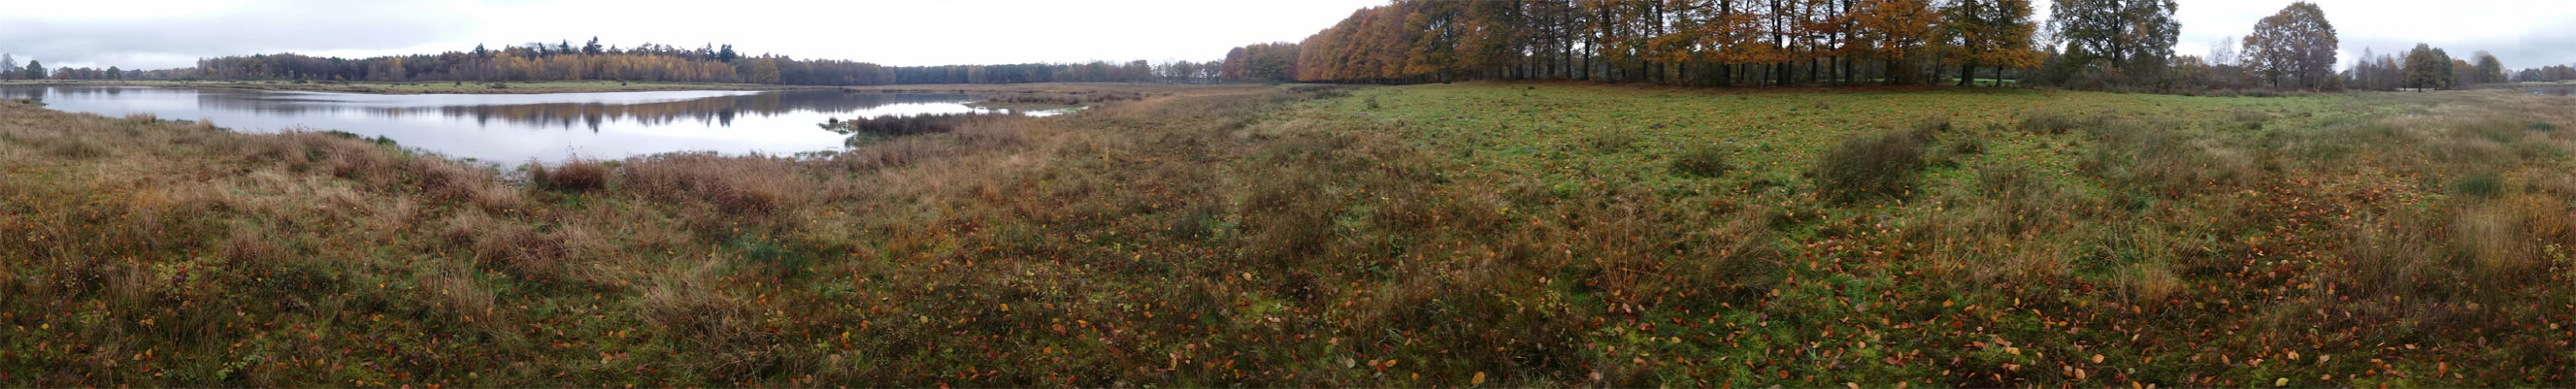 landgoed-vossenberg-panorama-voetzoekers.vr